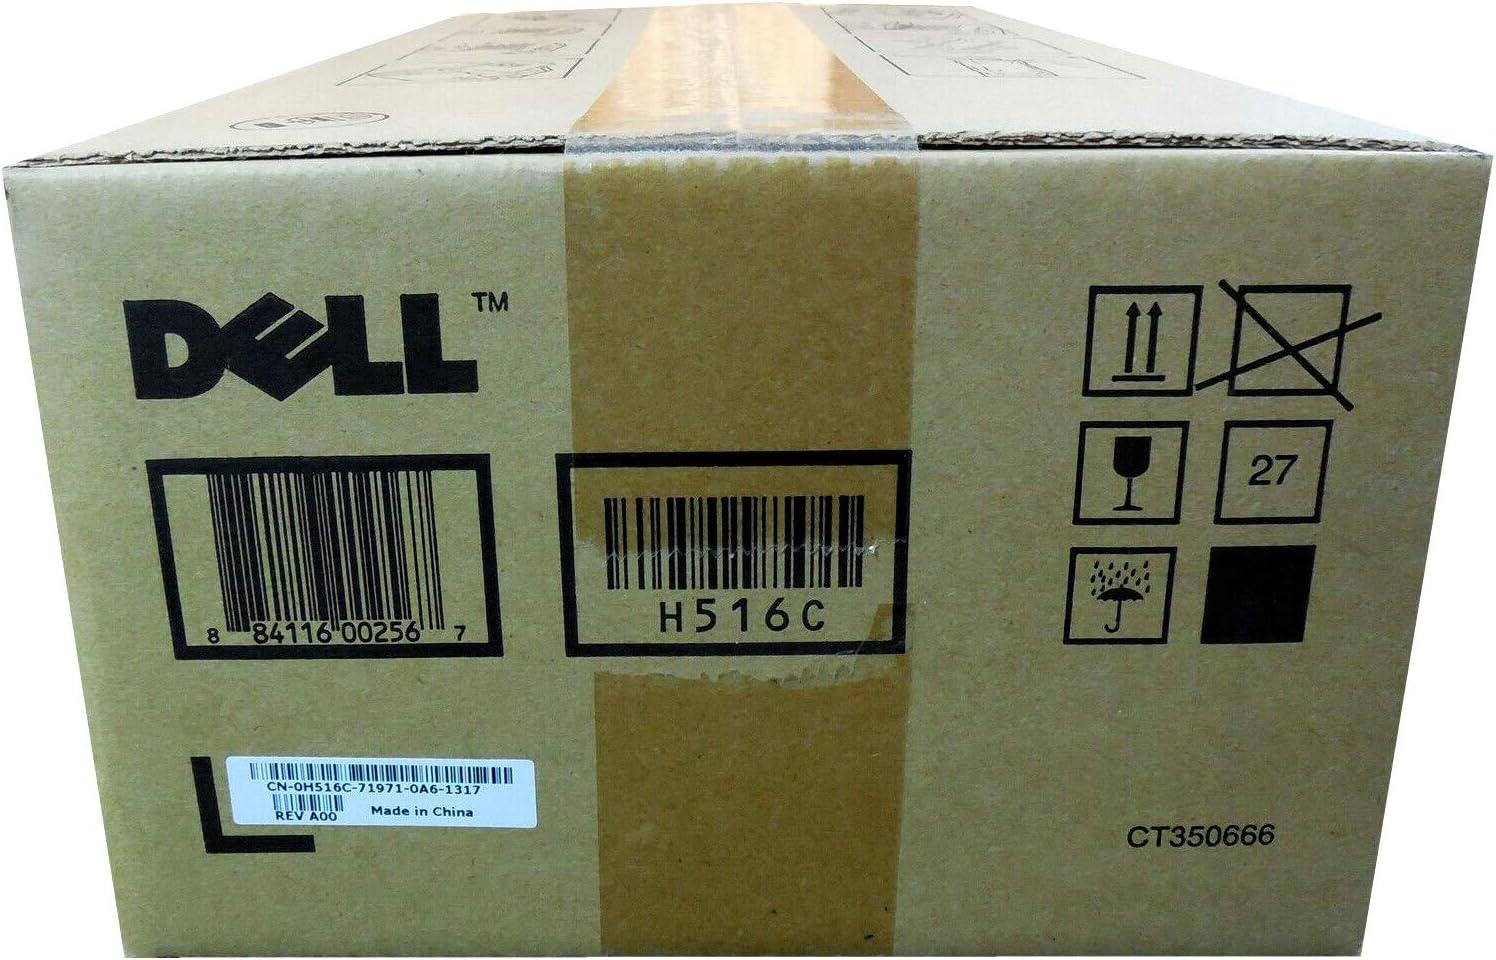 Dell H516C Black Toner Cartridge 3130cn/3130cnd Laser Printers